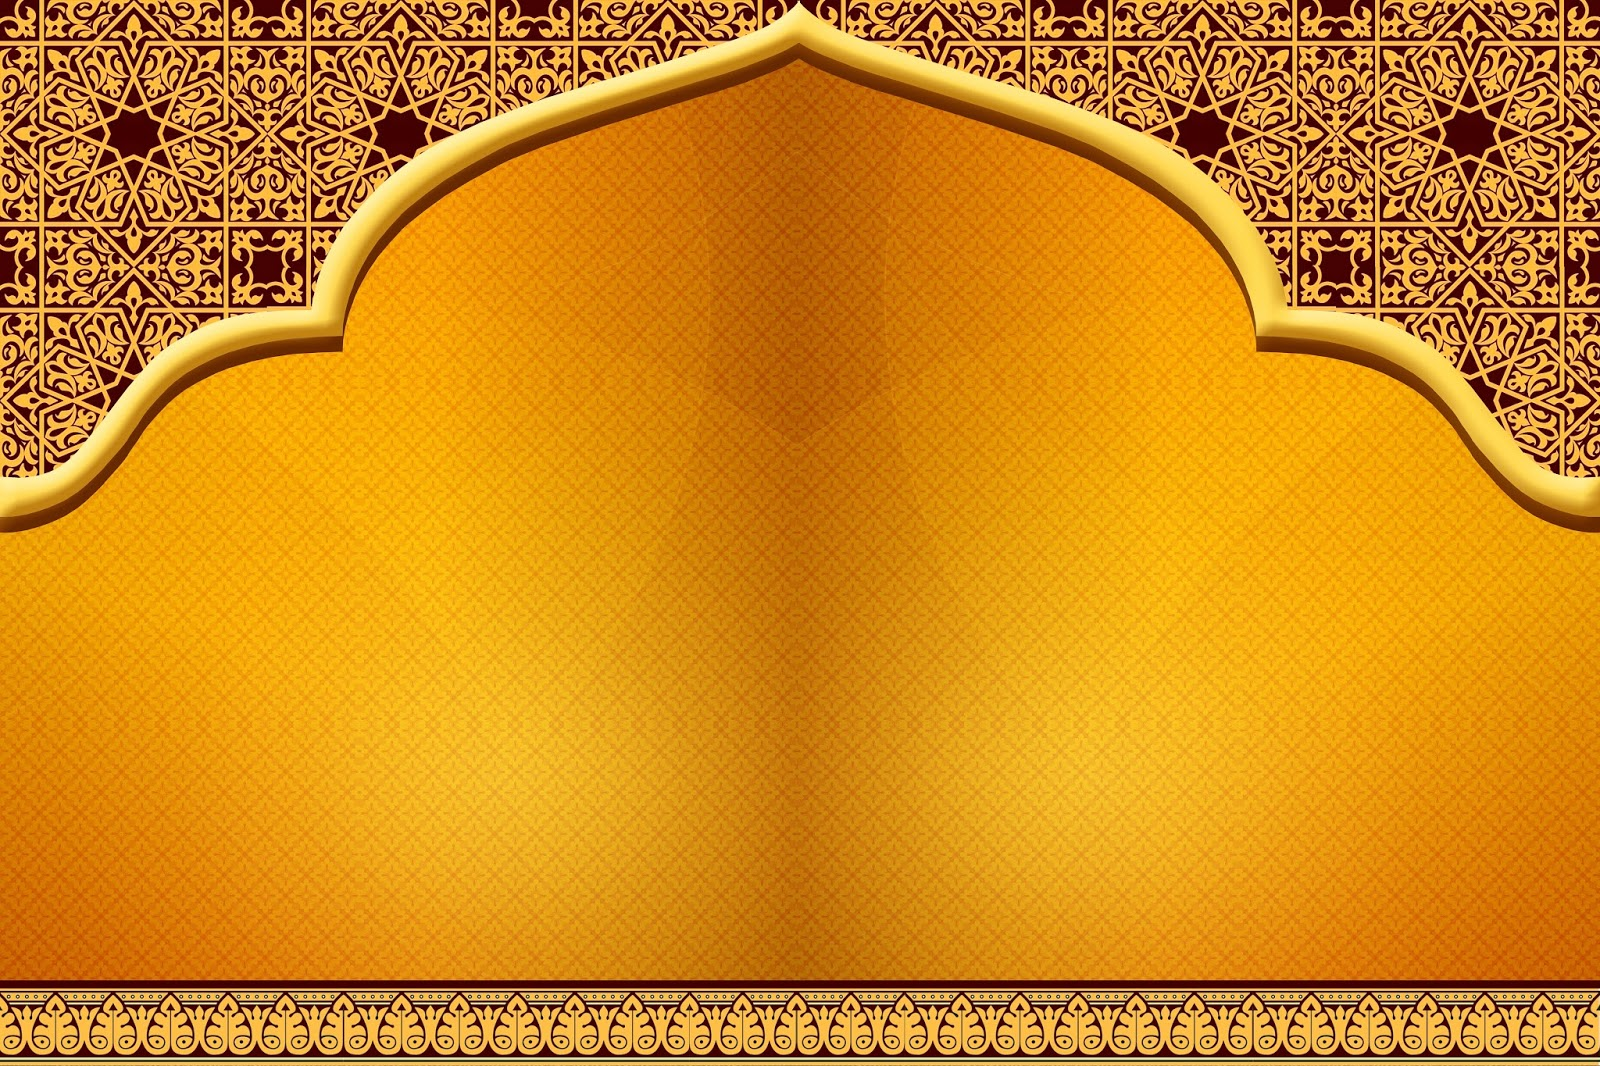 Background Polos Untuk Power Point Koleksi Gambar HD